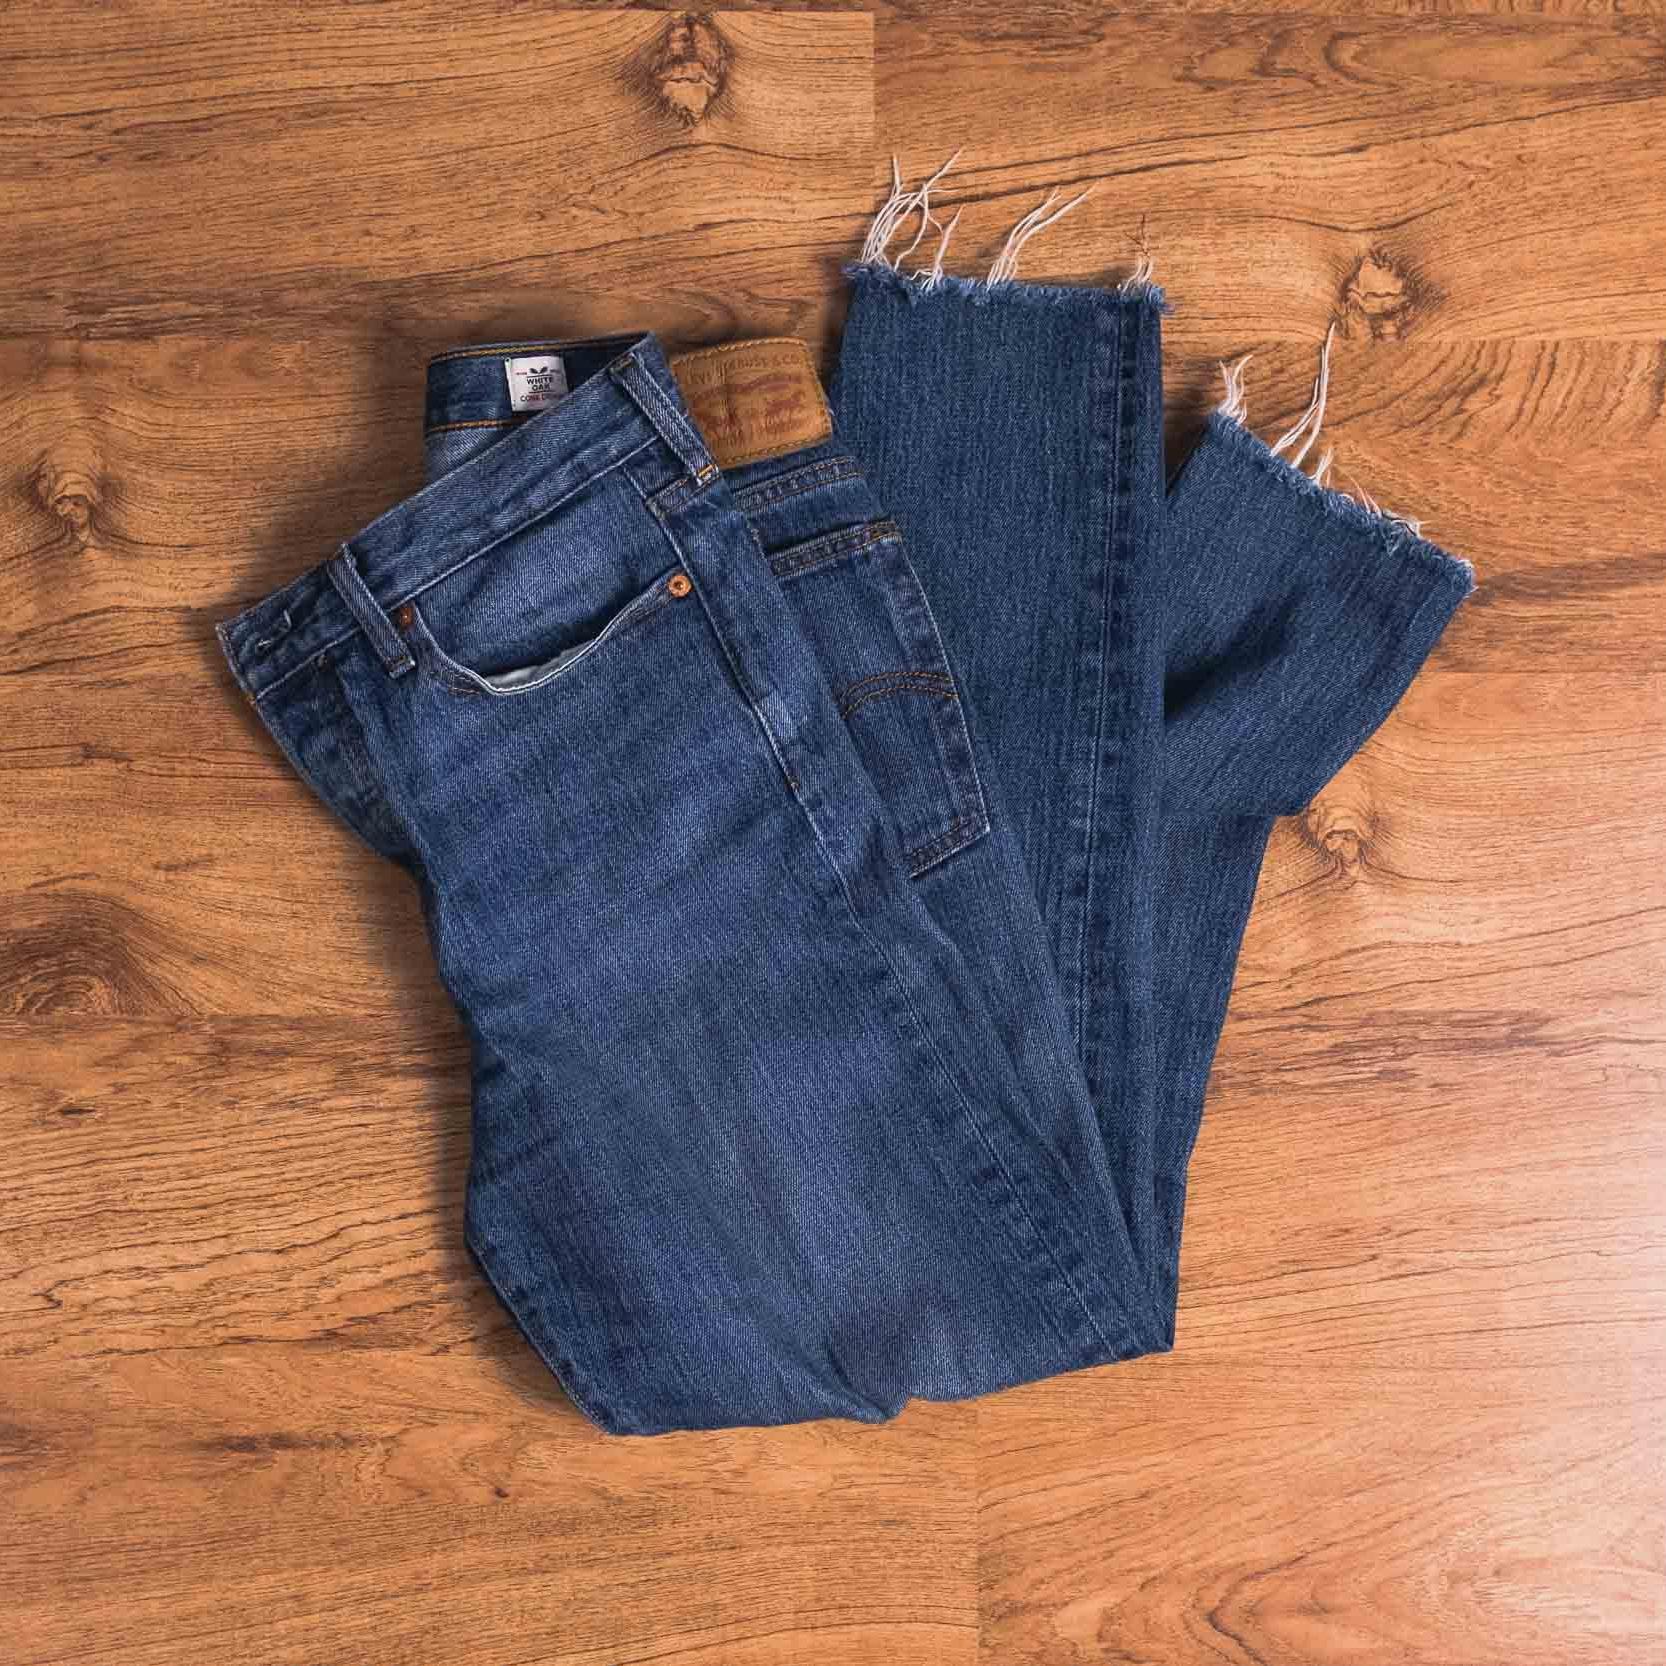 High waisted jeans ( Levi 's)